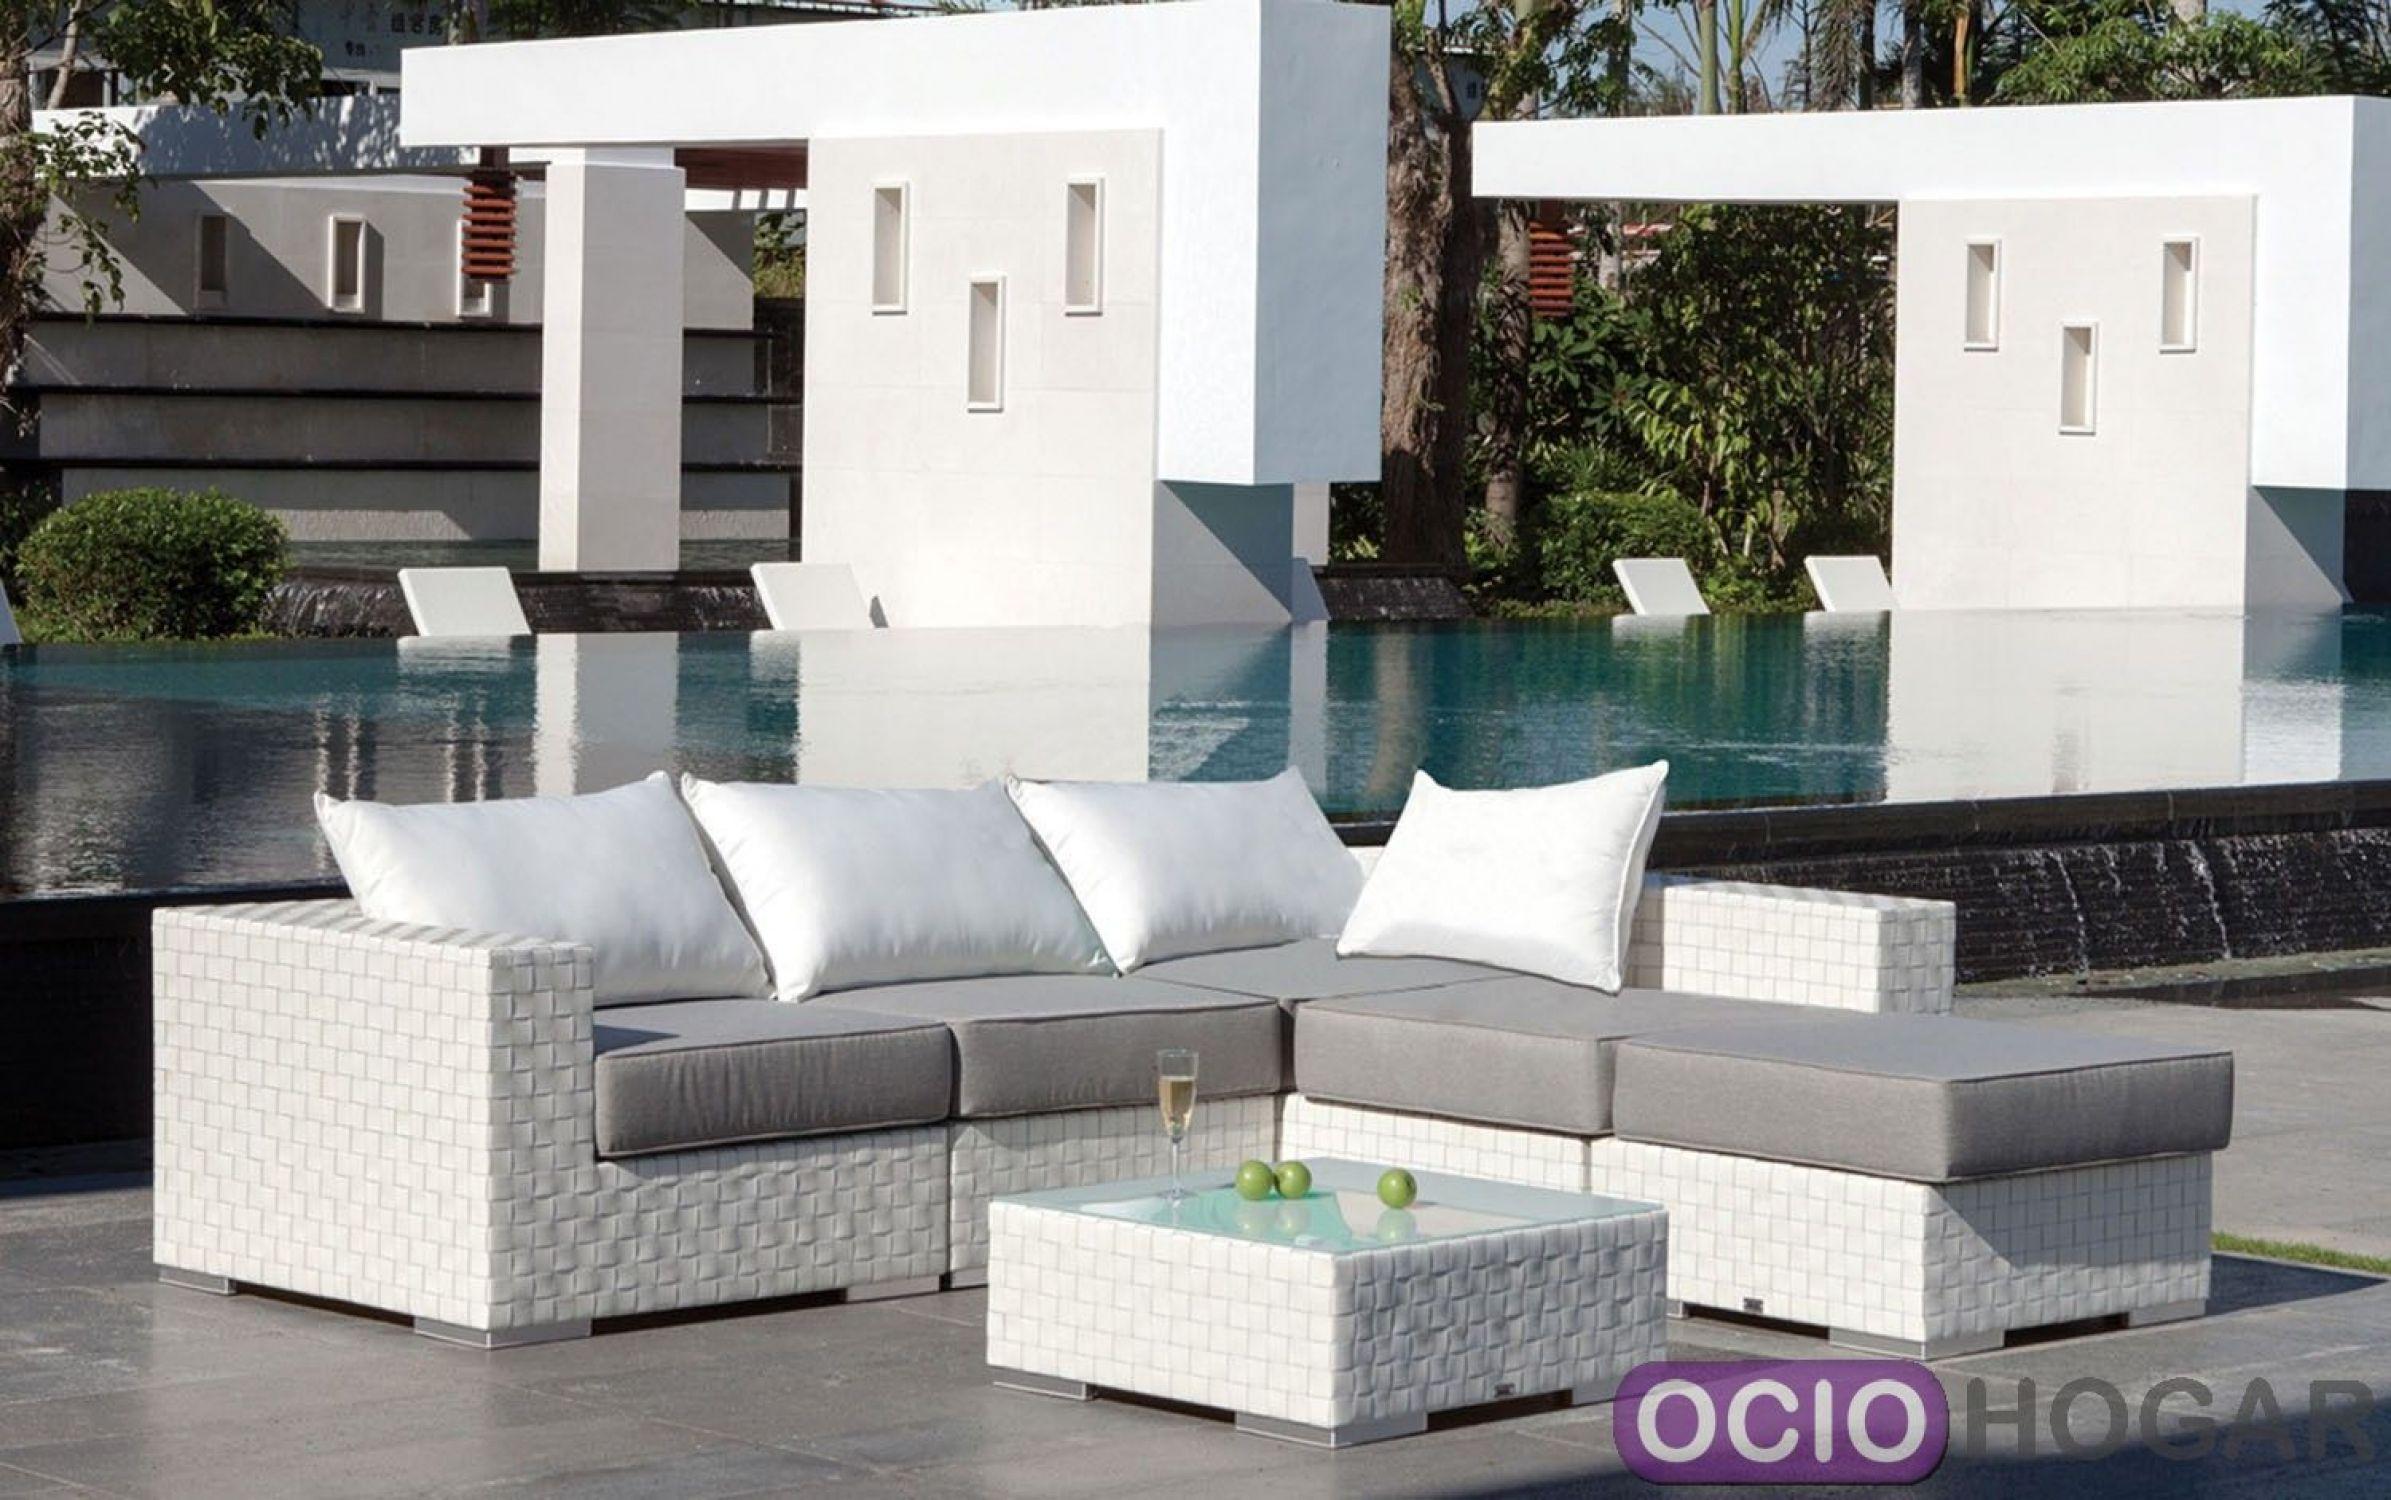 Sof modular y mesa de jard n bah a majestic garden for Sofa exterior esquina